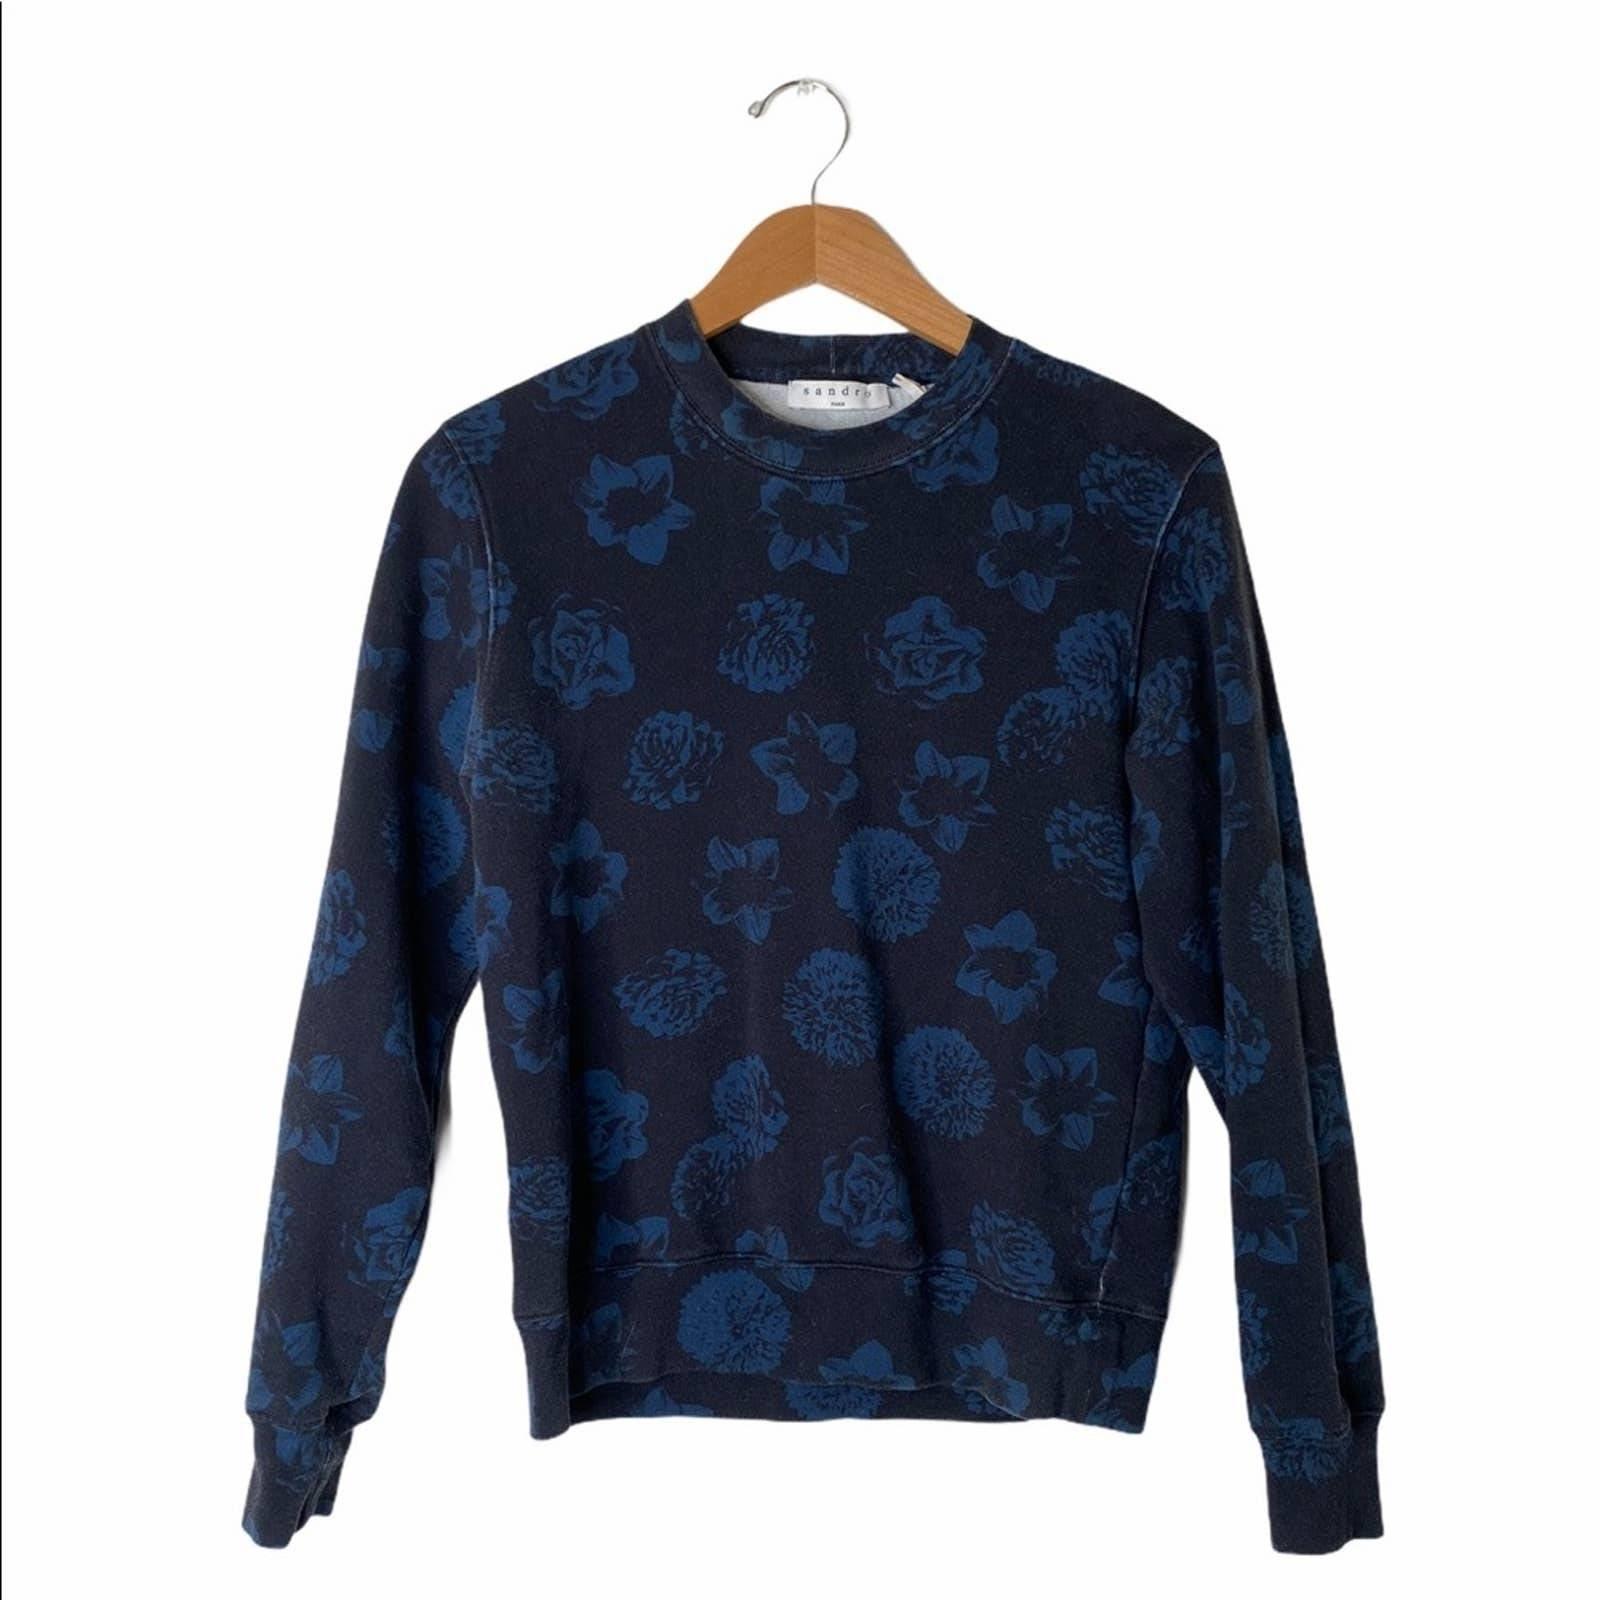 Sandro Paris Floral Print Sweatshirt